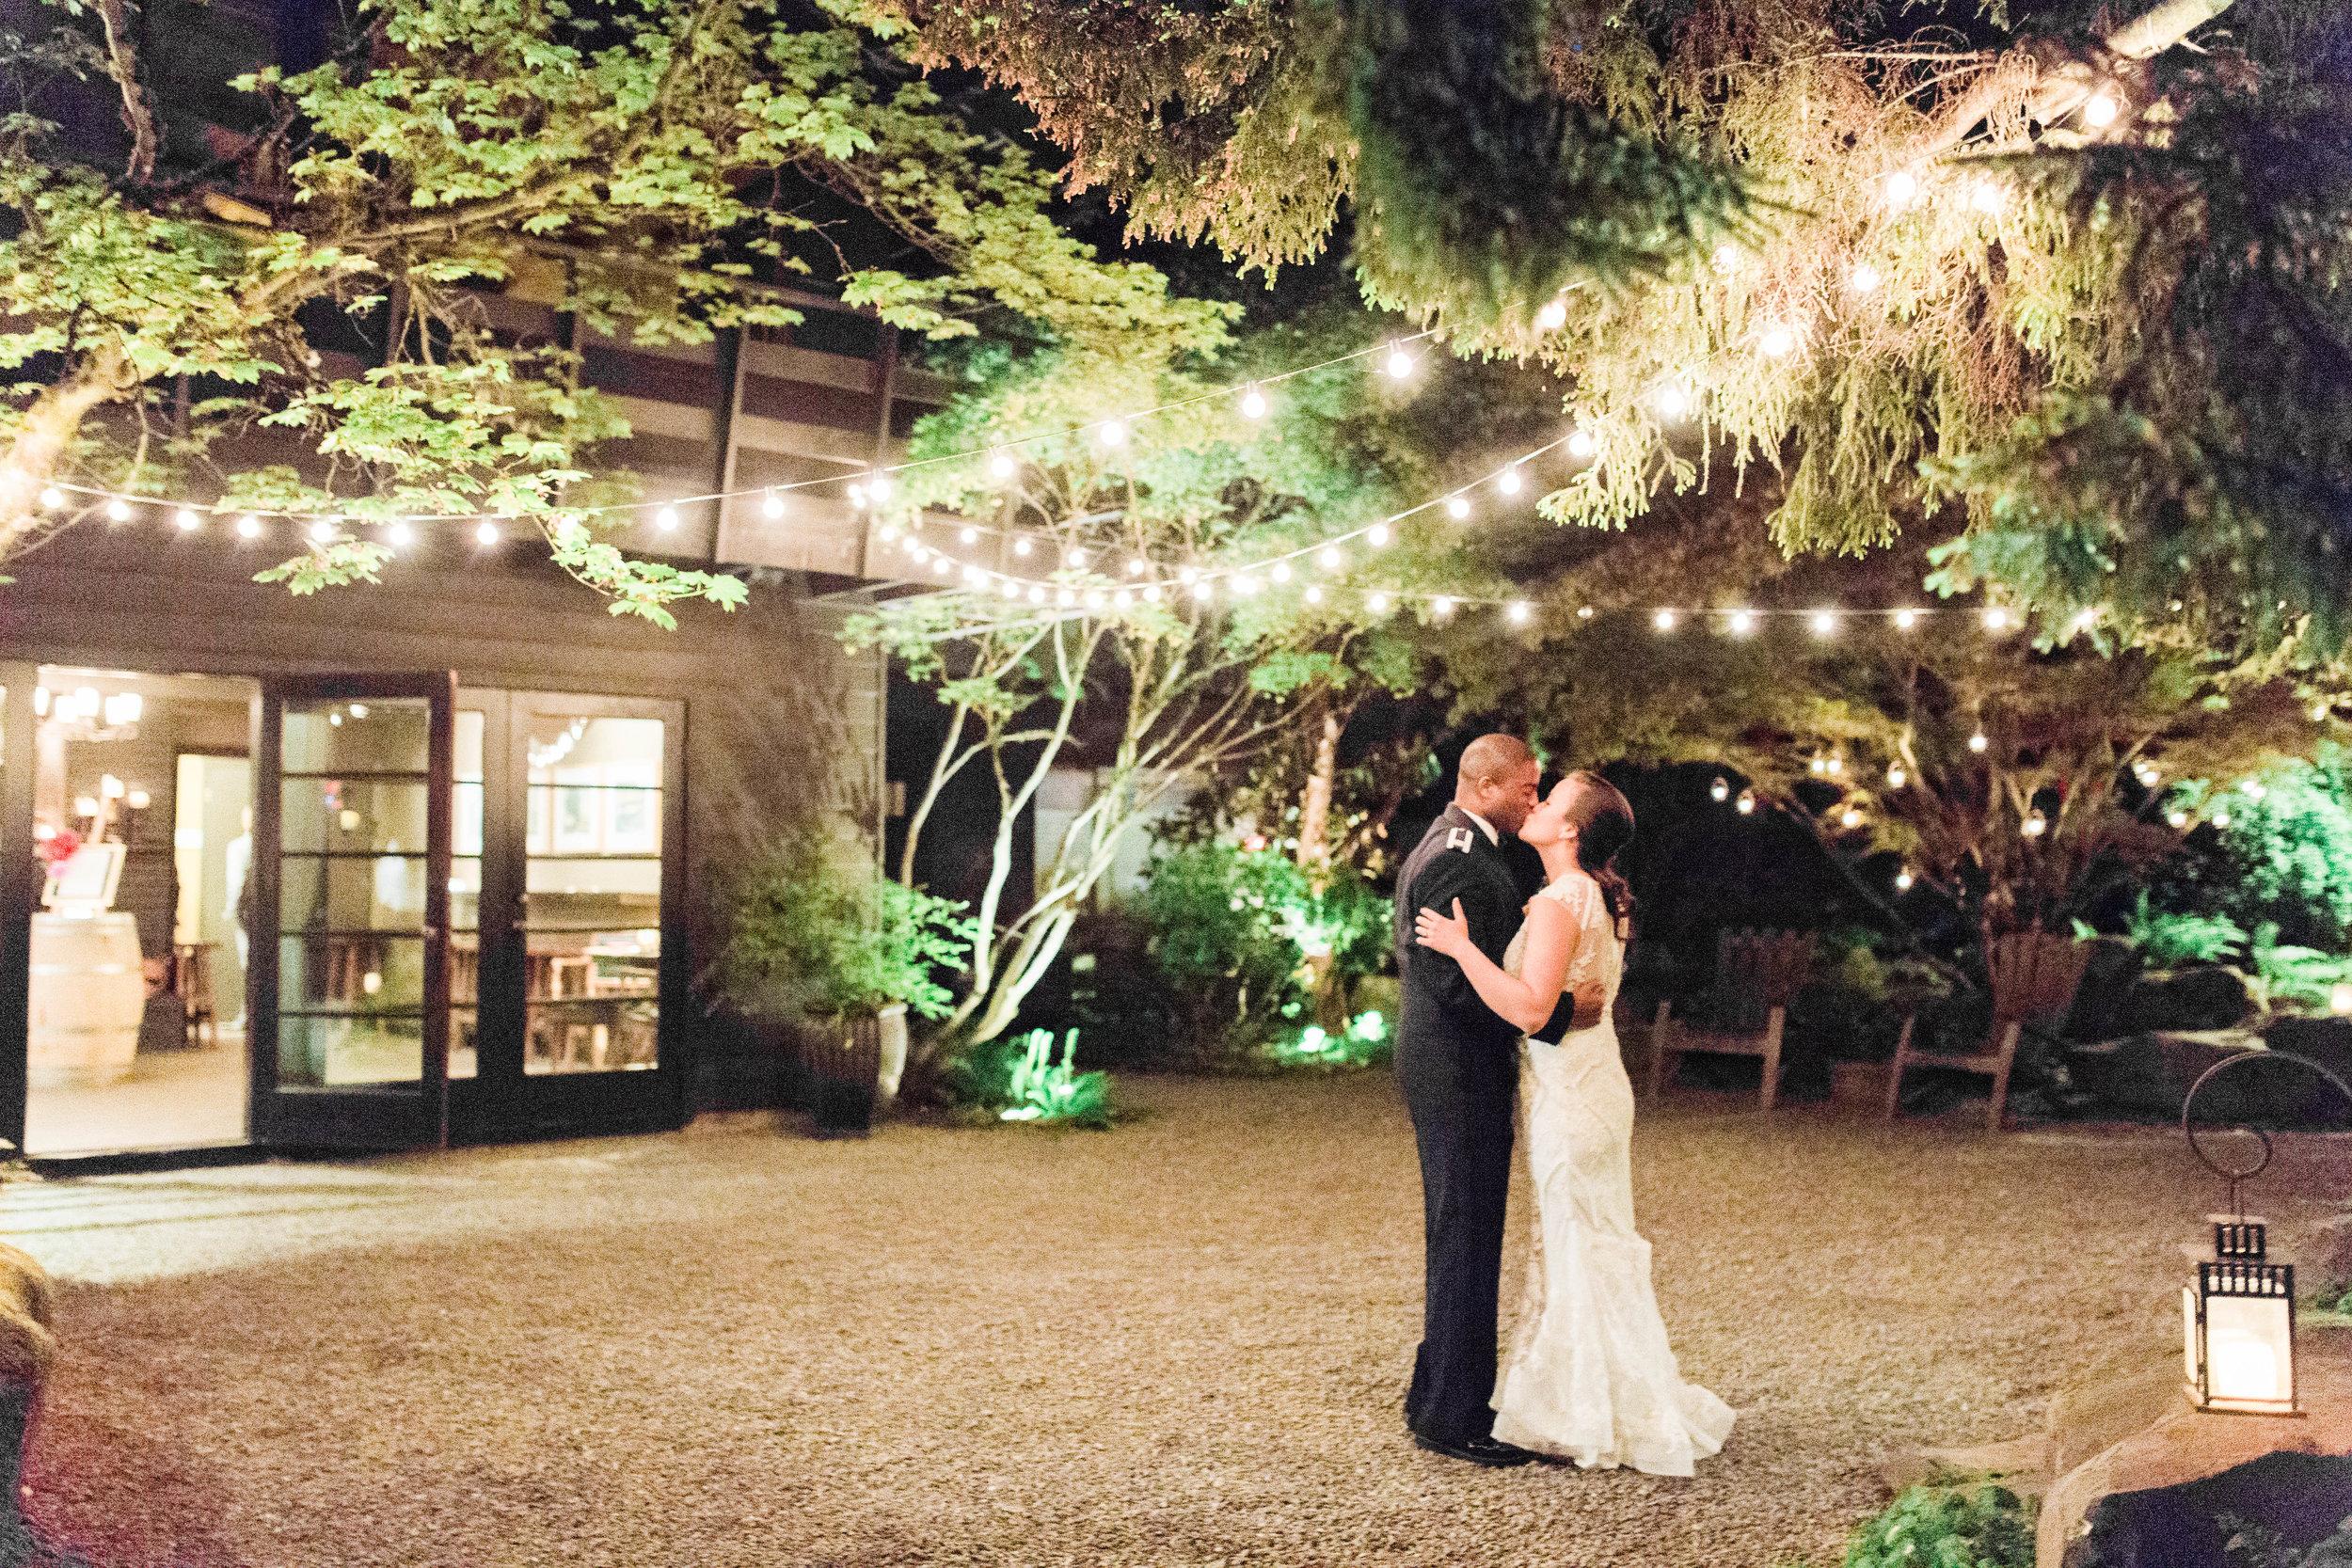 Wedding Planner Seattle   Wedding Wise   Kerry Jeanne Photography   JM Cellars Wedding